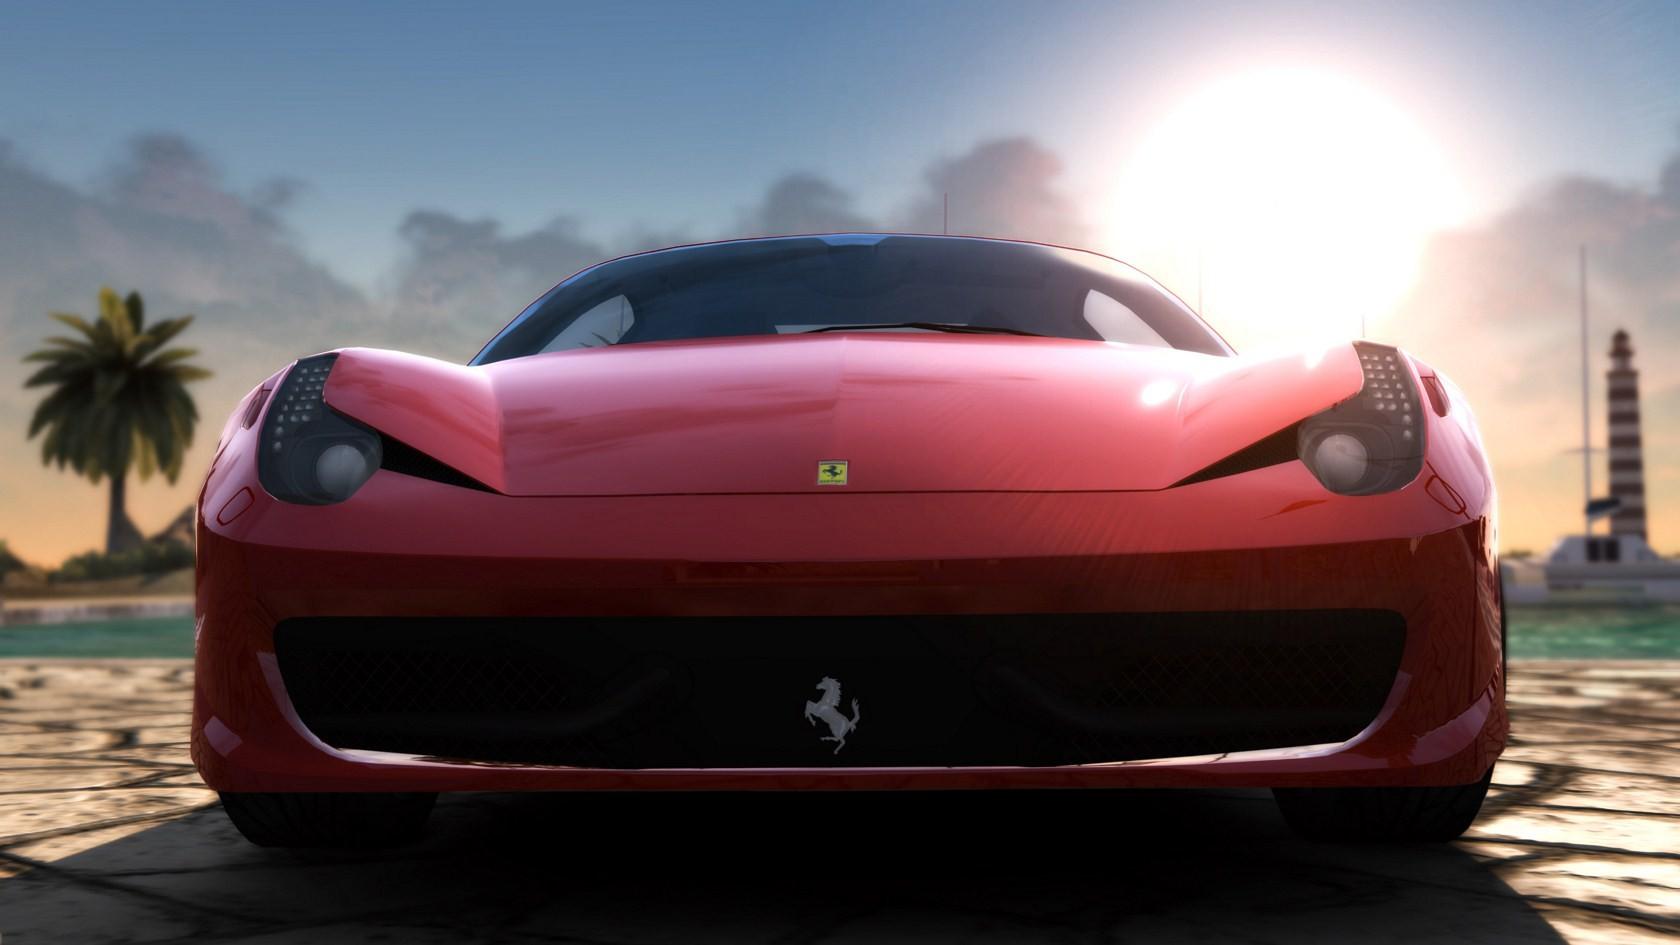 Test Drive Unlimited 2 - Screenshot